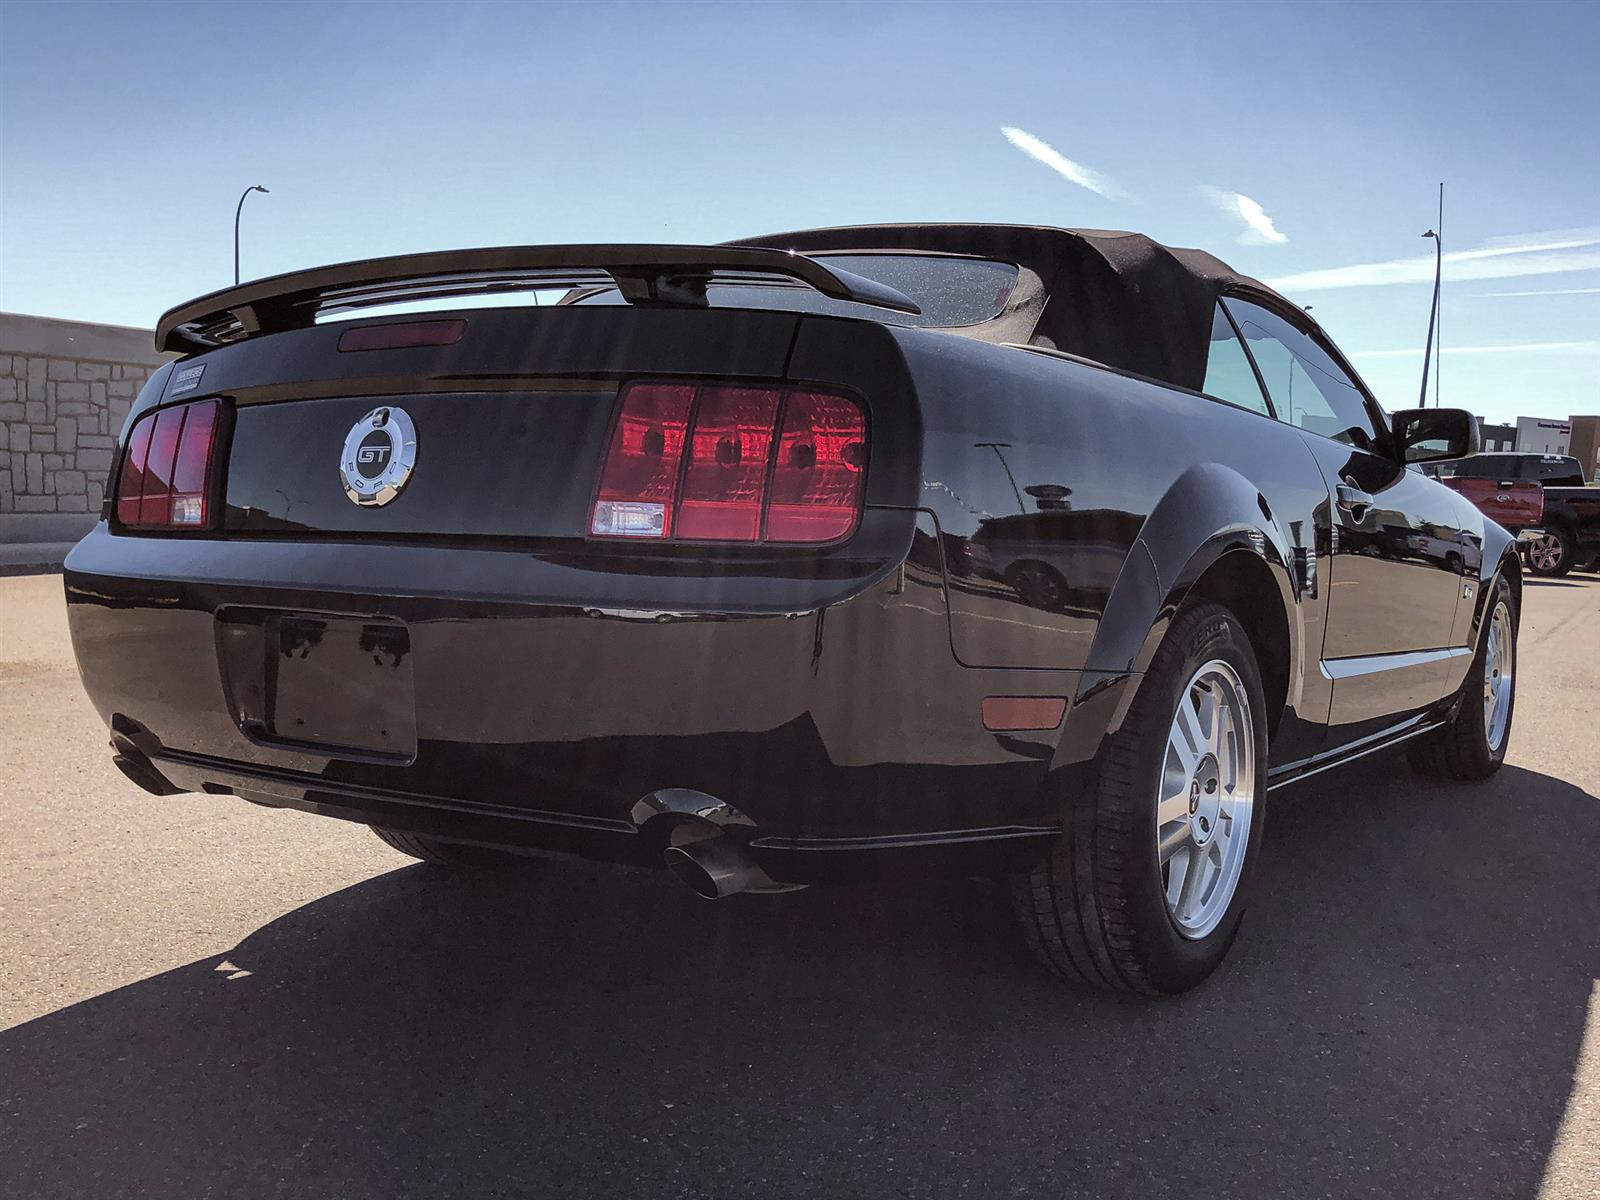 2007 Ford Mustang GT | 4.6L V8 | RWD | CONVERTIBLE | MANUAL